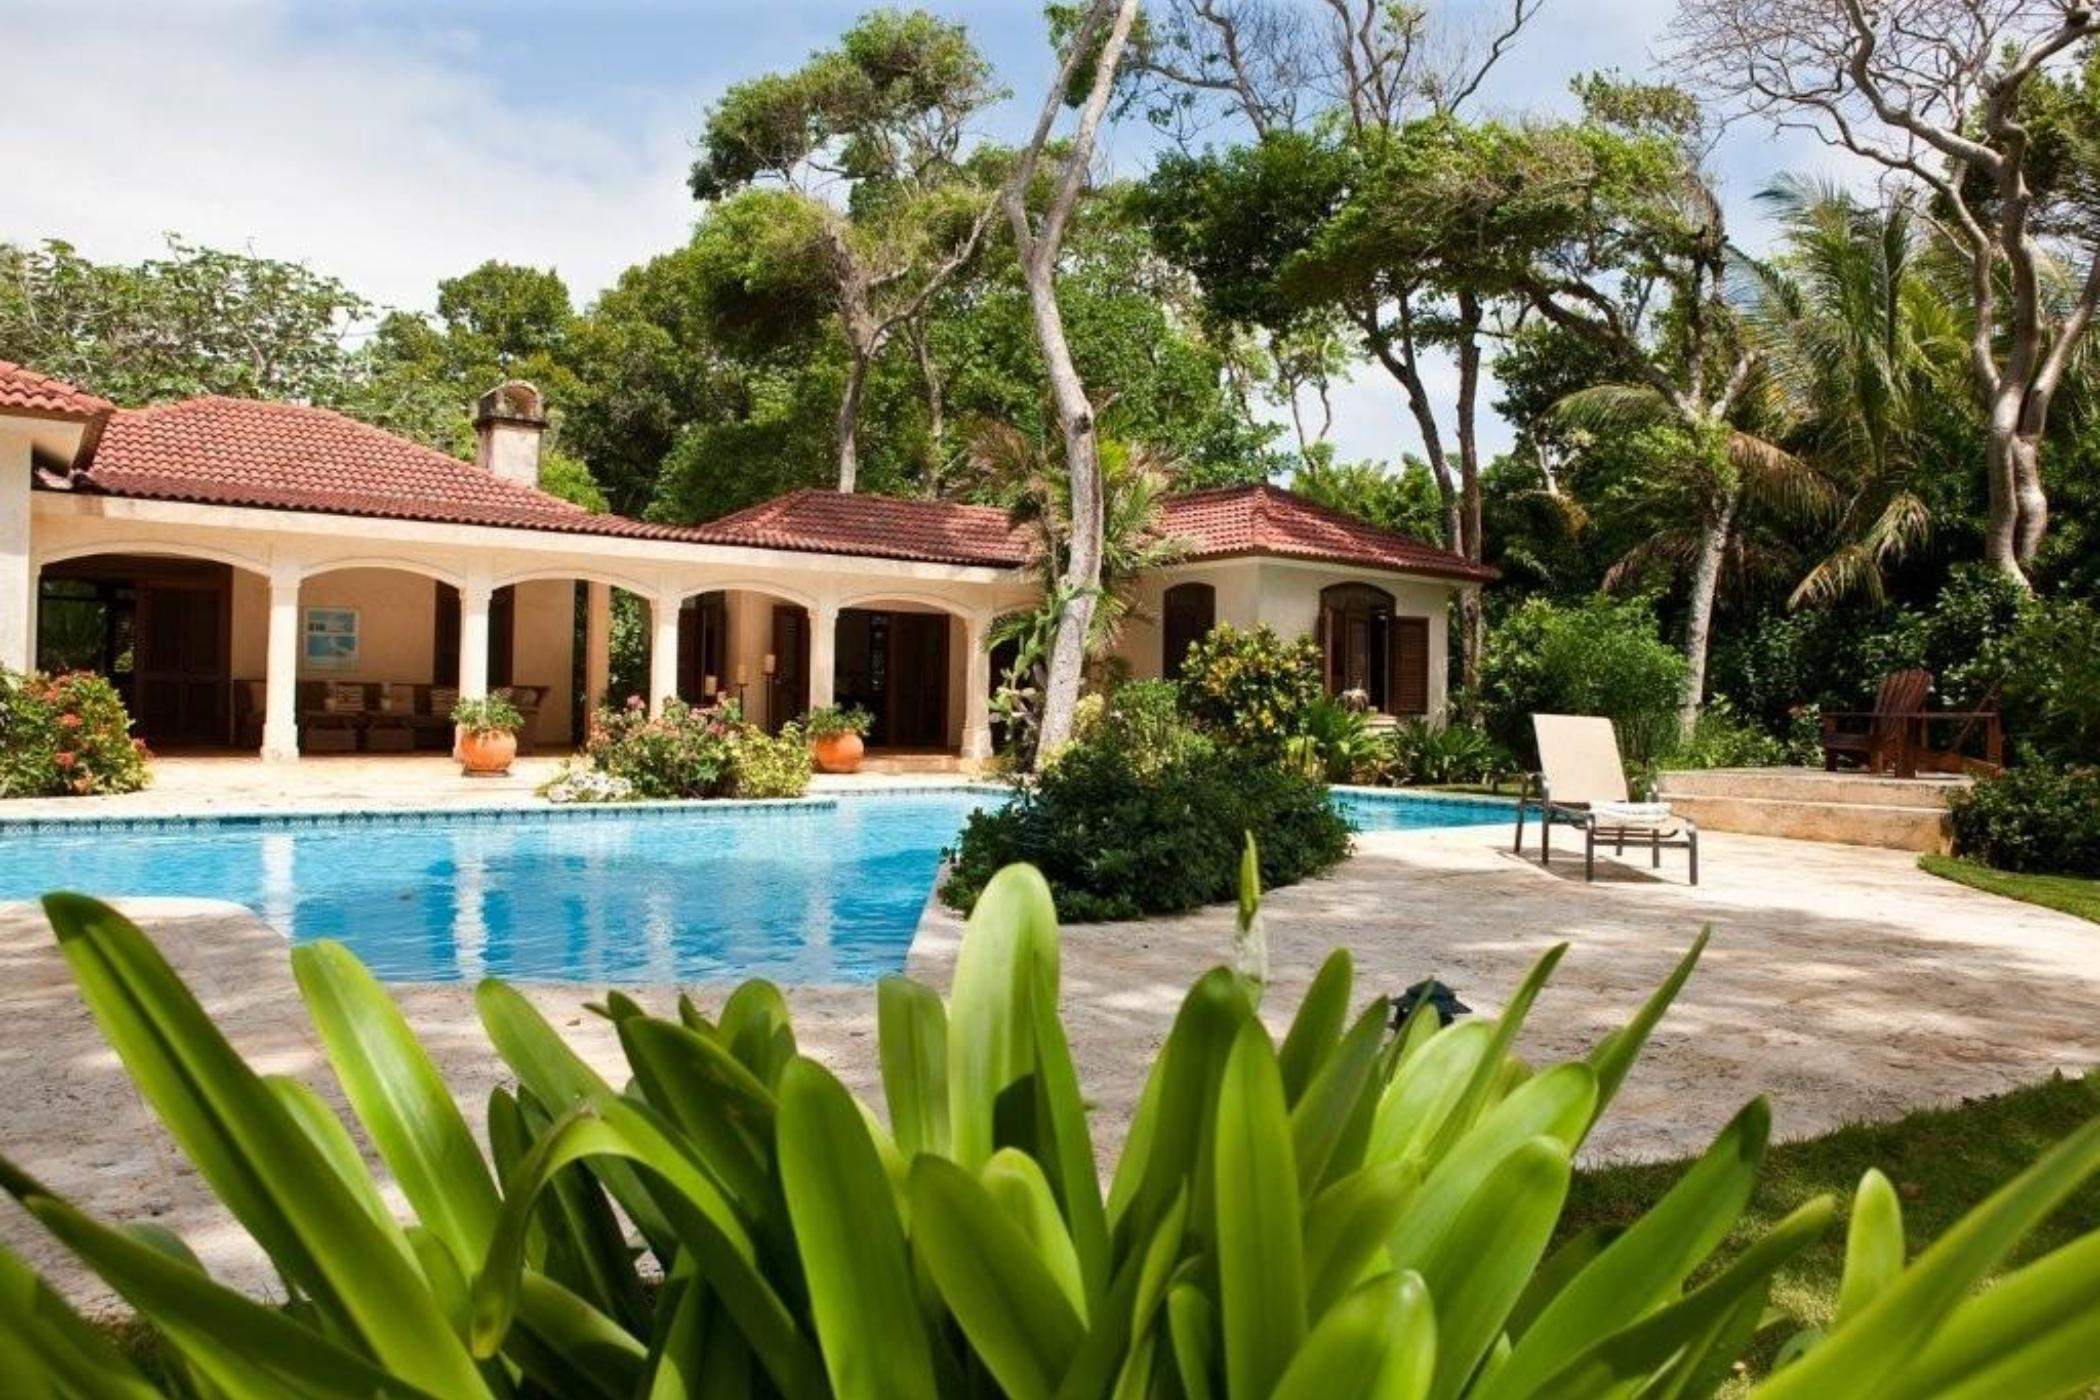 Villa Florita